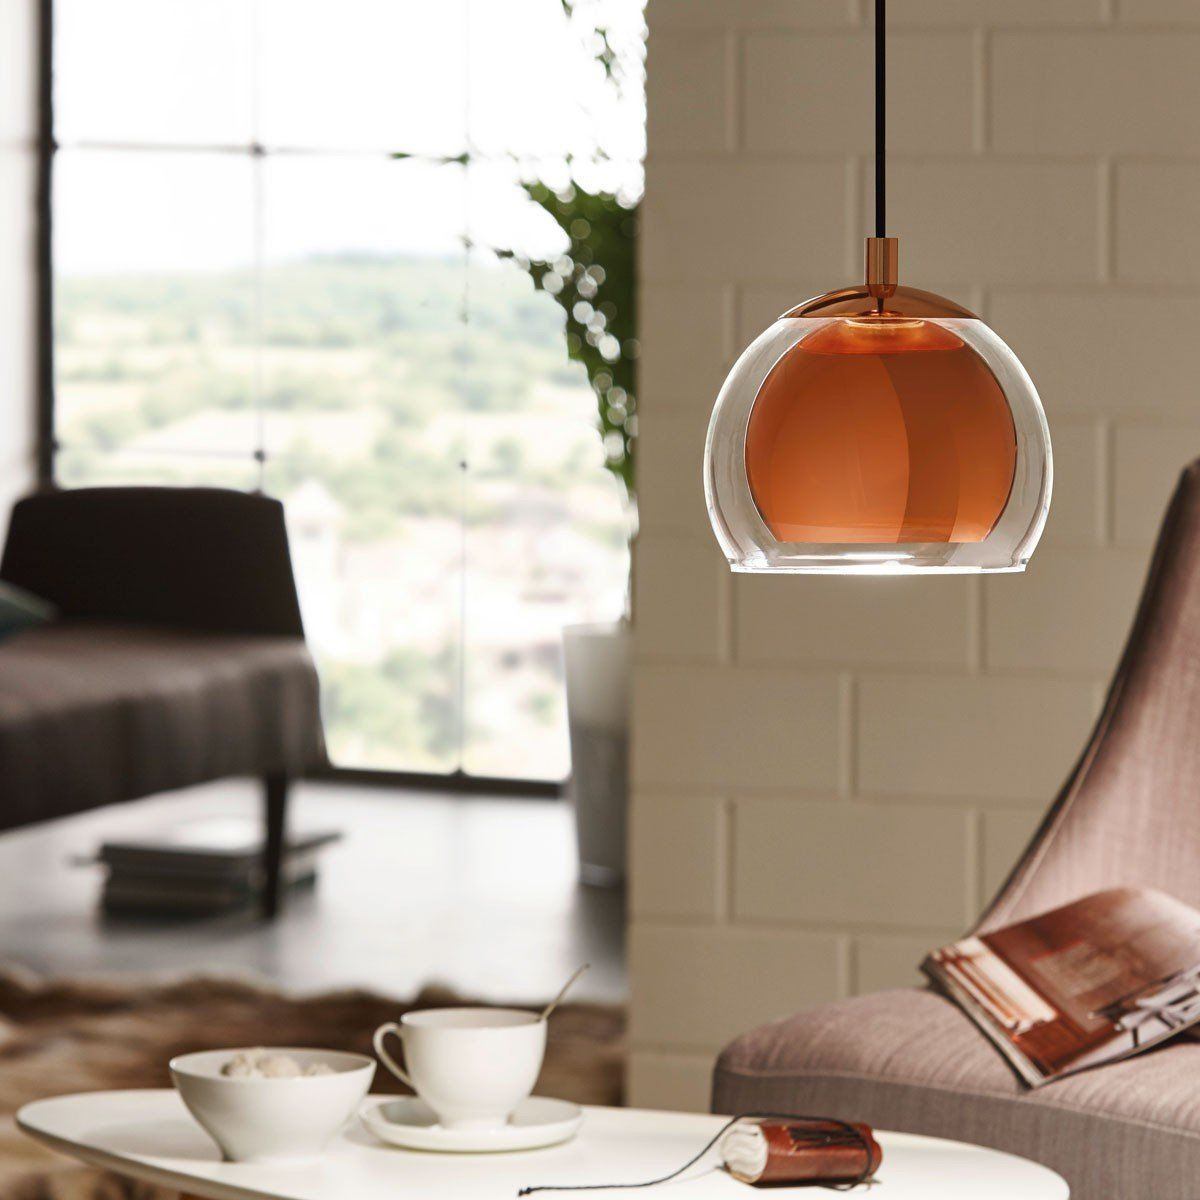 phantasievolle inspiration teleskop wandlampe beste pic der ccbdcafe